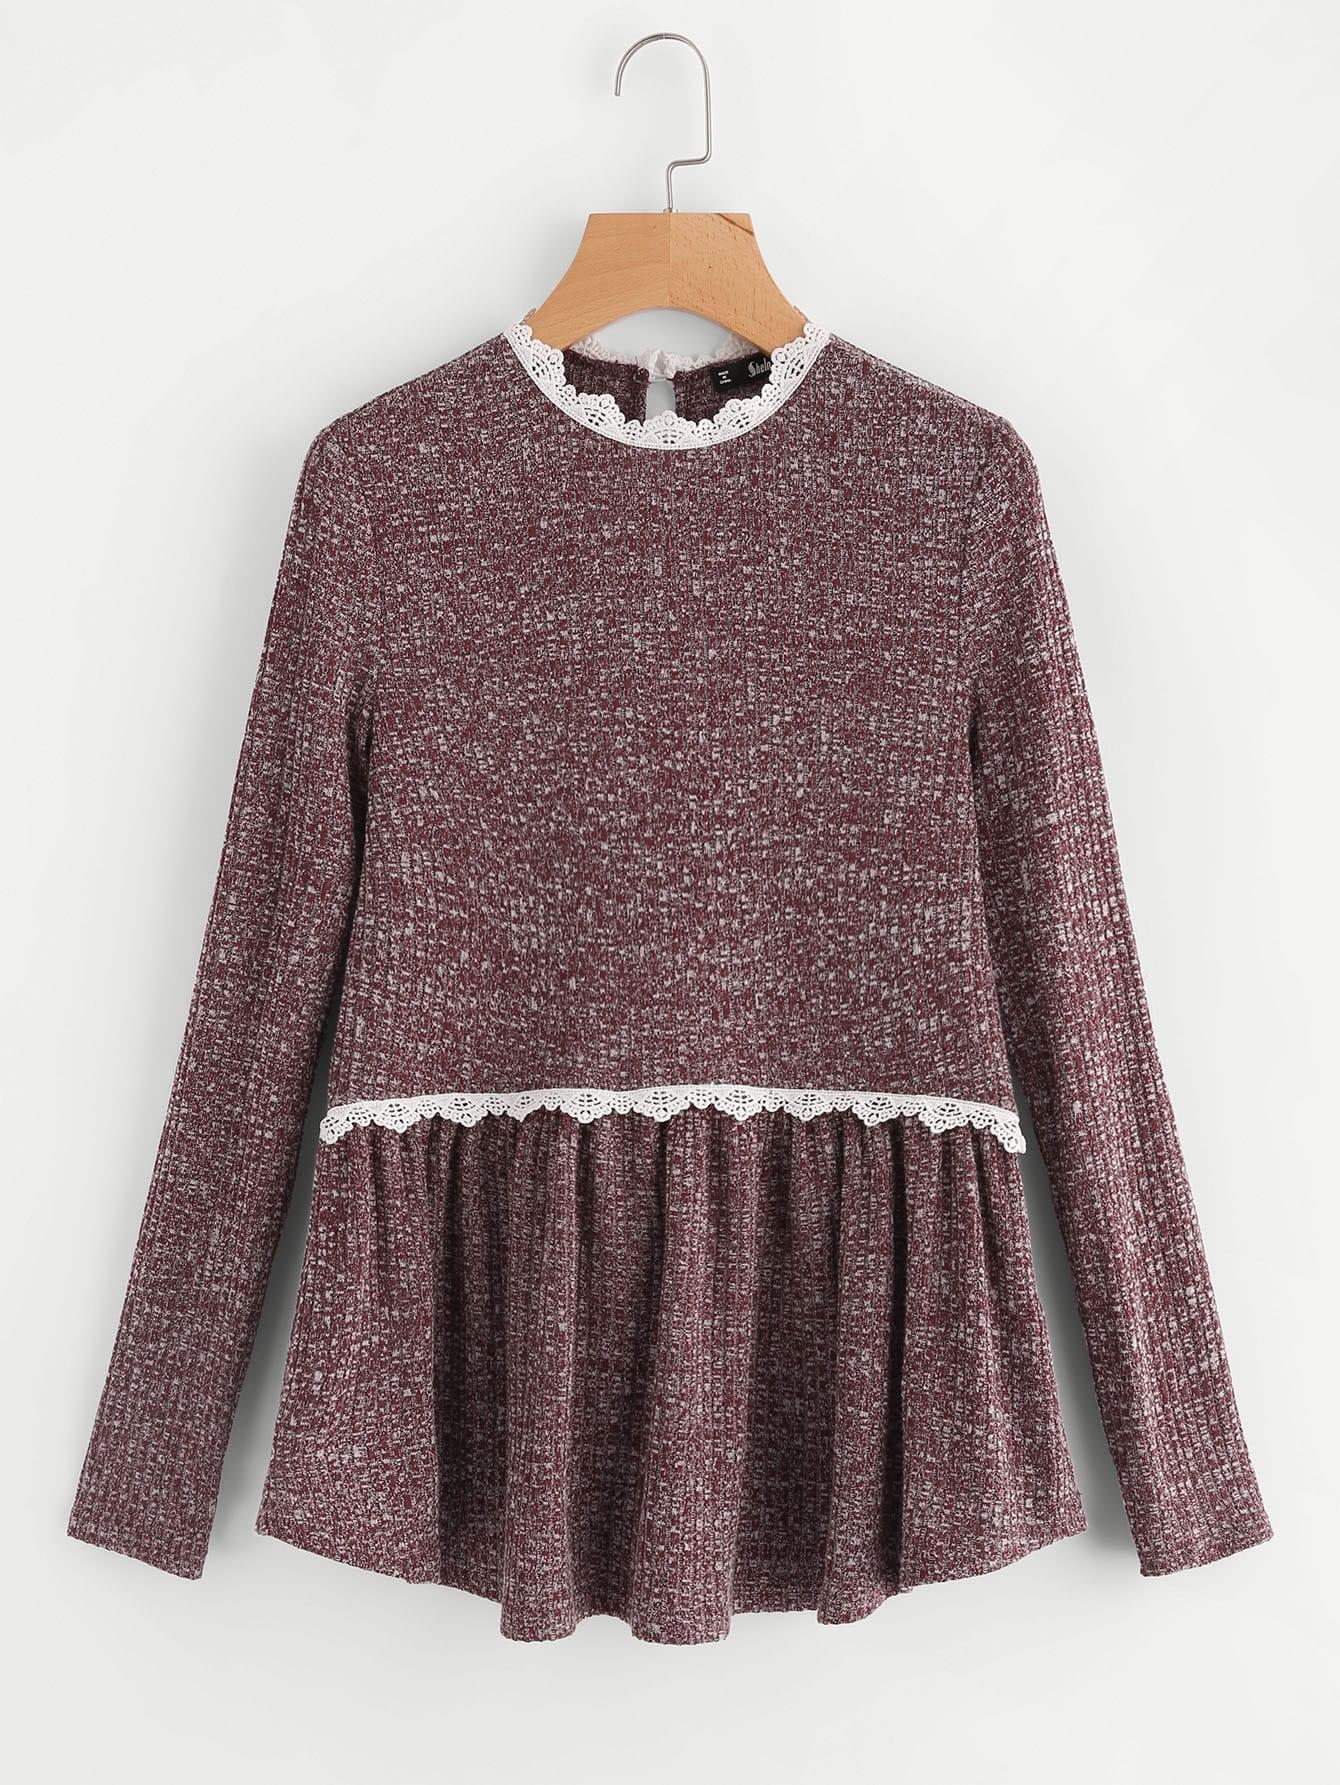 Lace Trim Marled Knit Smock Tee tee170808701